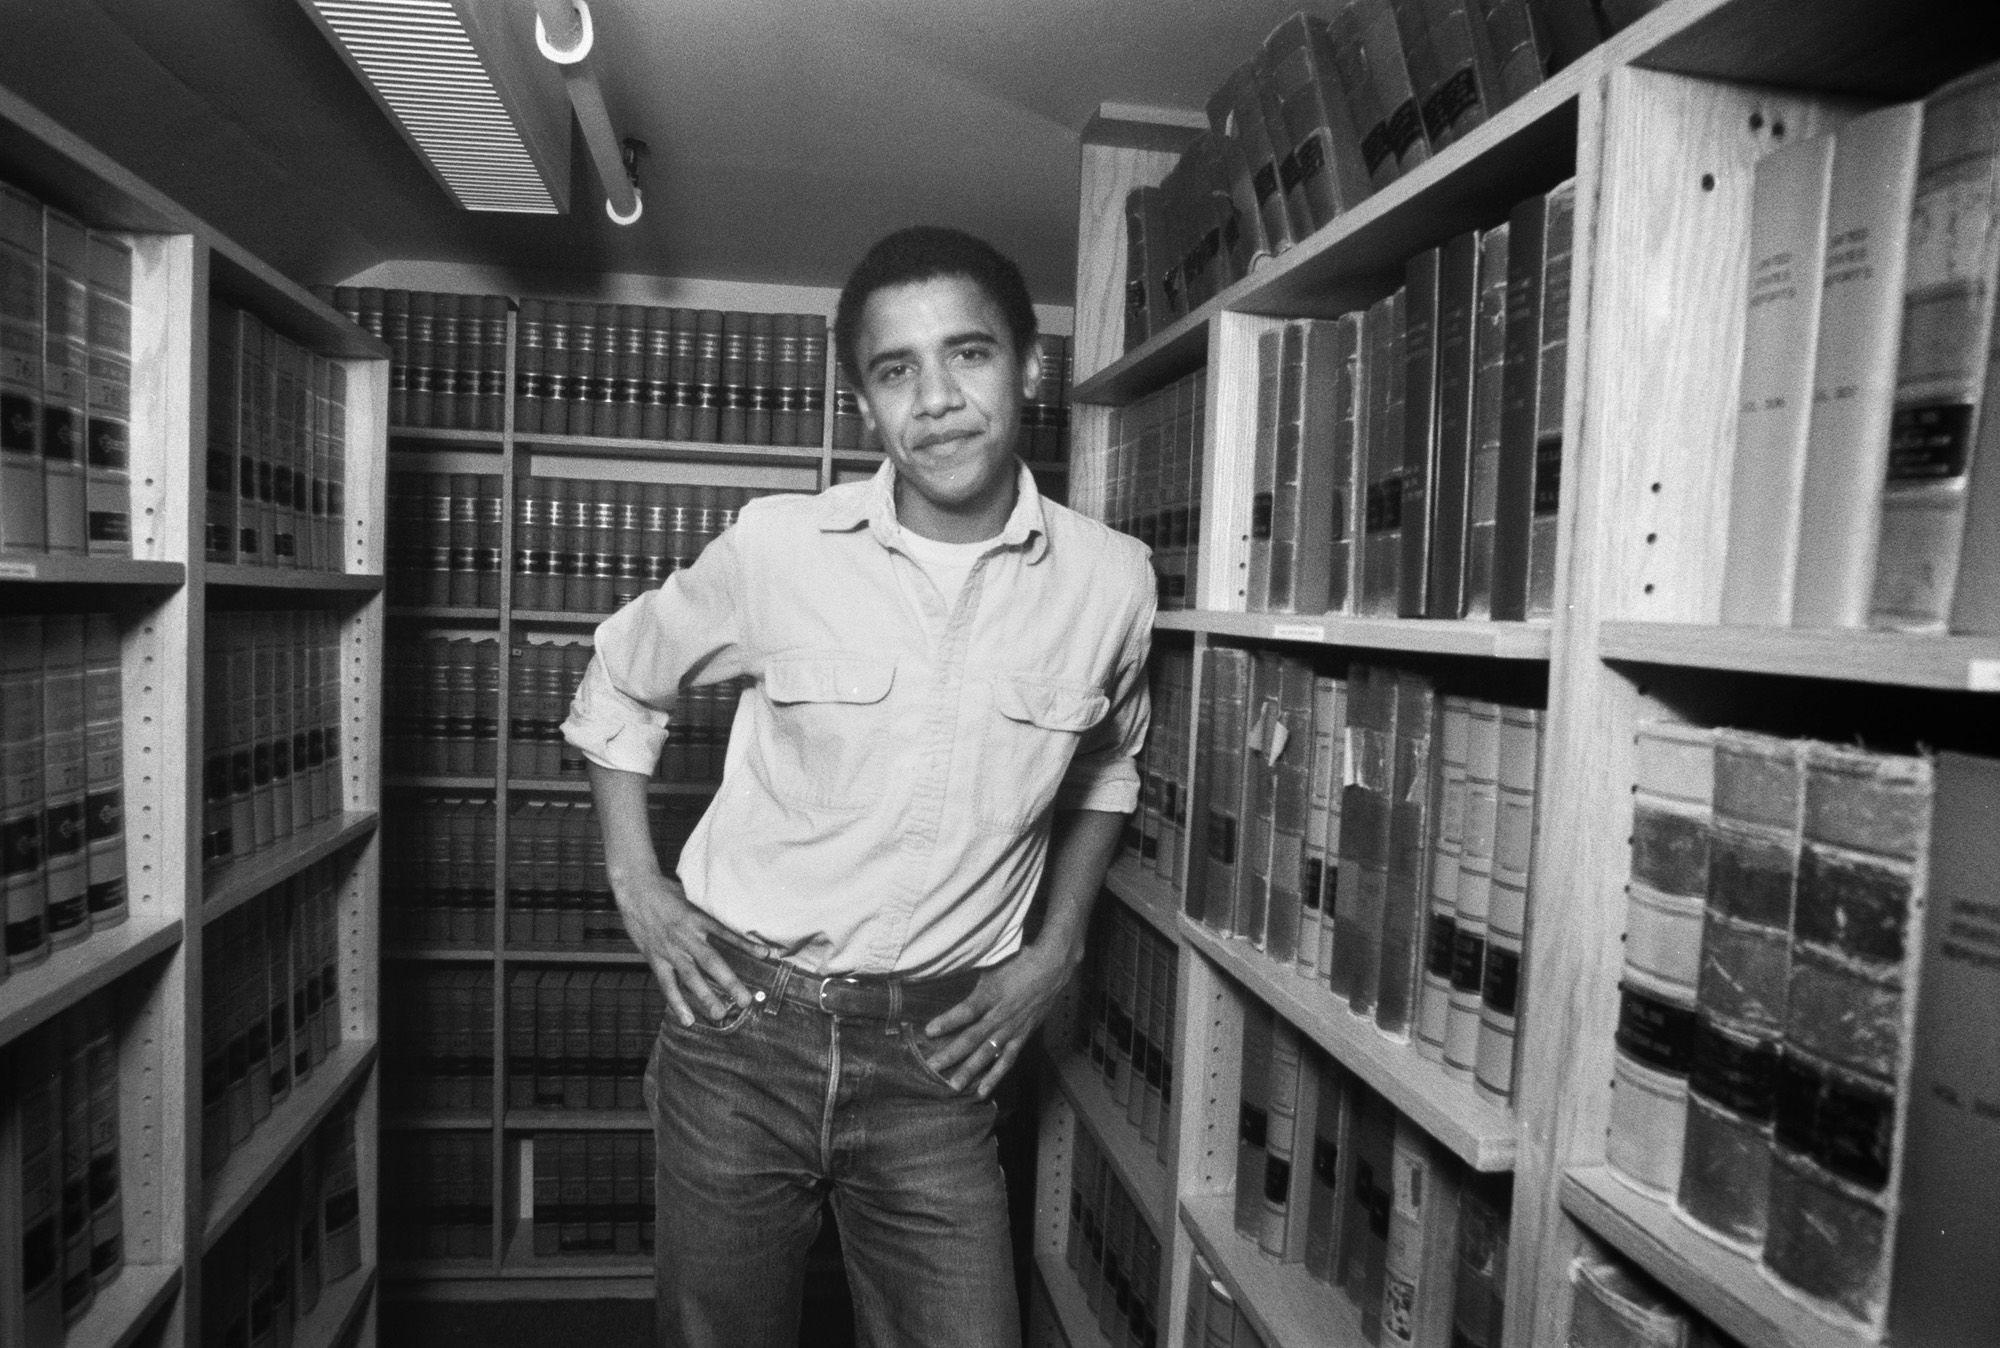 A Harvardon 1990-ben (fotó: Joe Wrinn/Harvard University/Corbis via Getty Images)